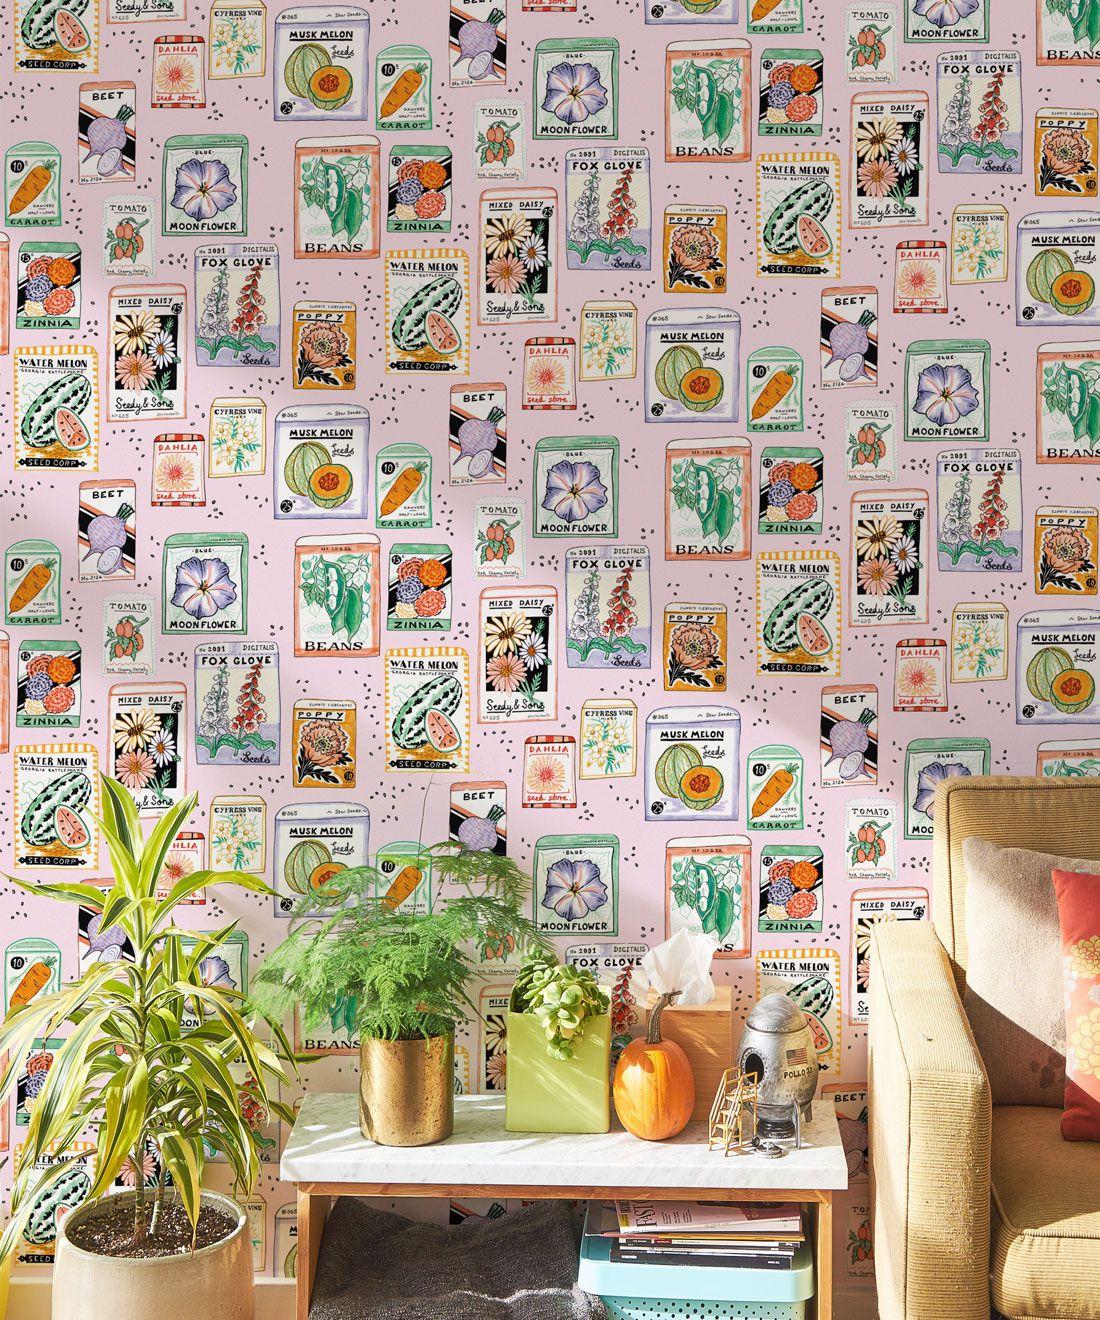 Seed Packets Wallpaper featuring watermelon, carrot, beet, beans, poppy, daisy insitu